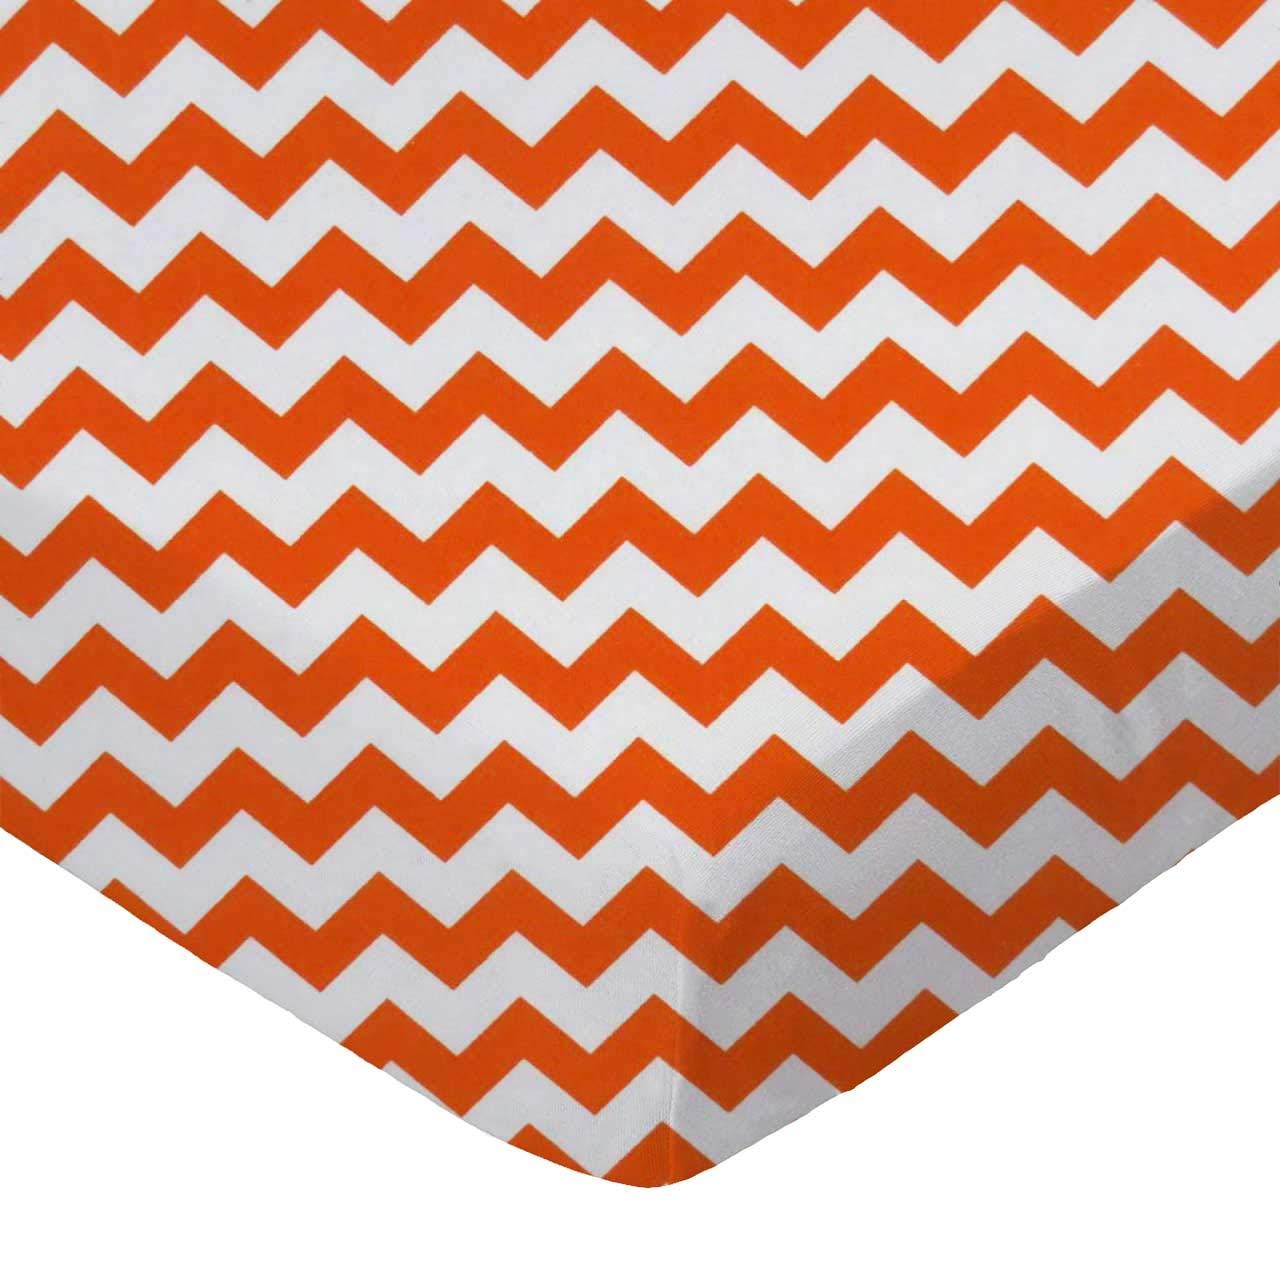 SheetWorld Fitted Crib / Toddler Sheet - Orange Chevron Zigzag - Made In USA by sheetworld   B00CF2TUMU